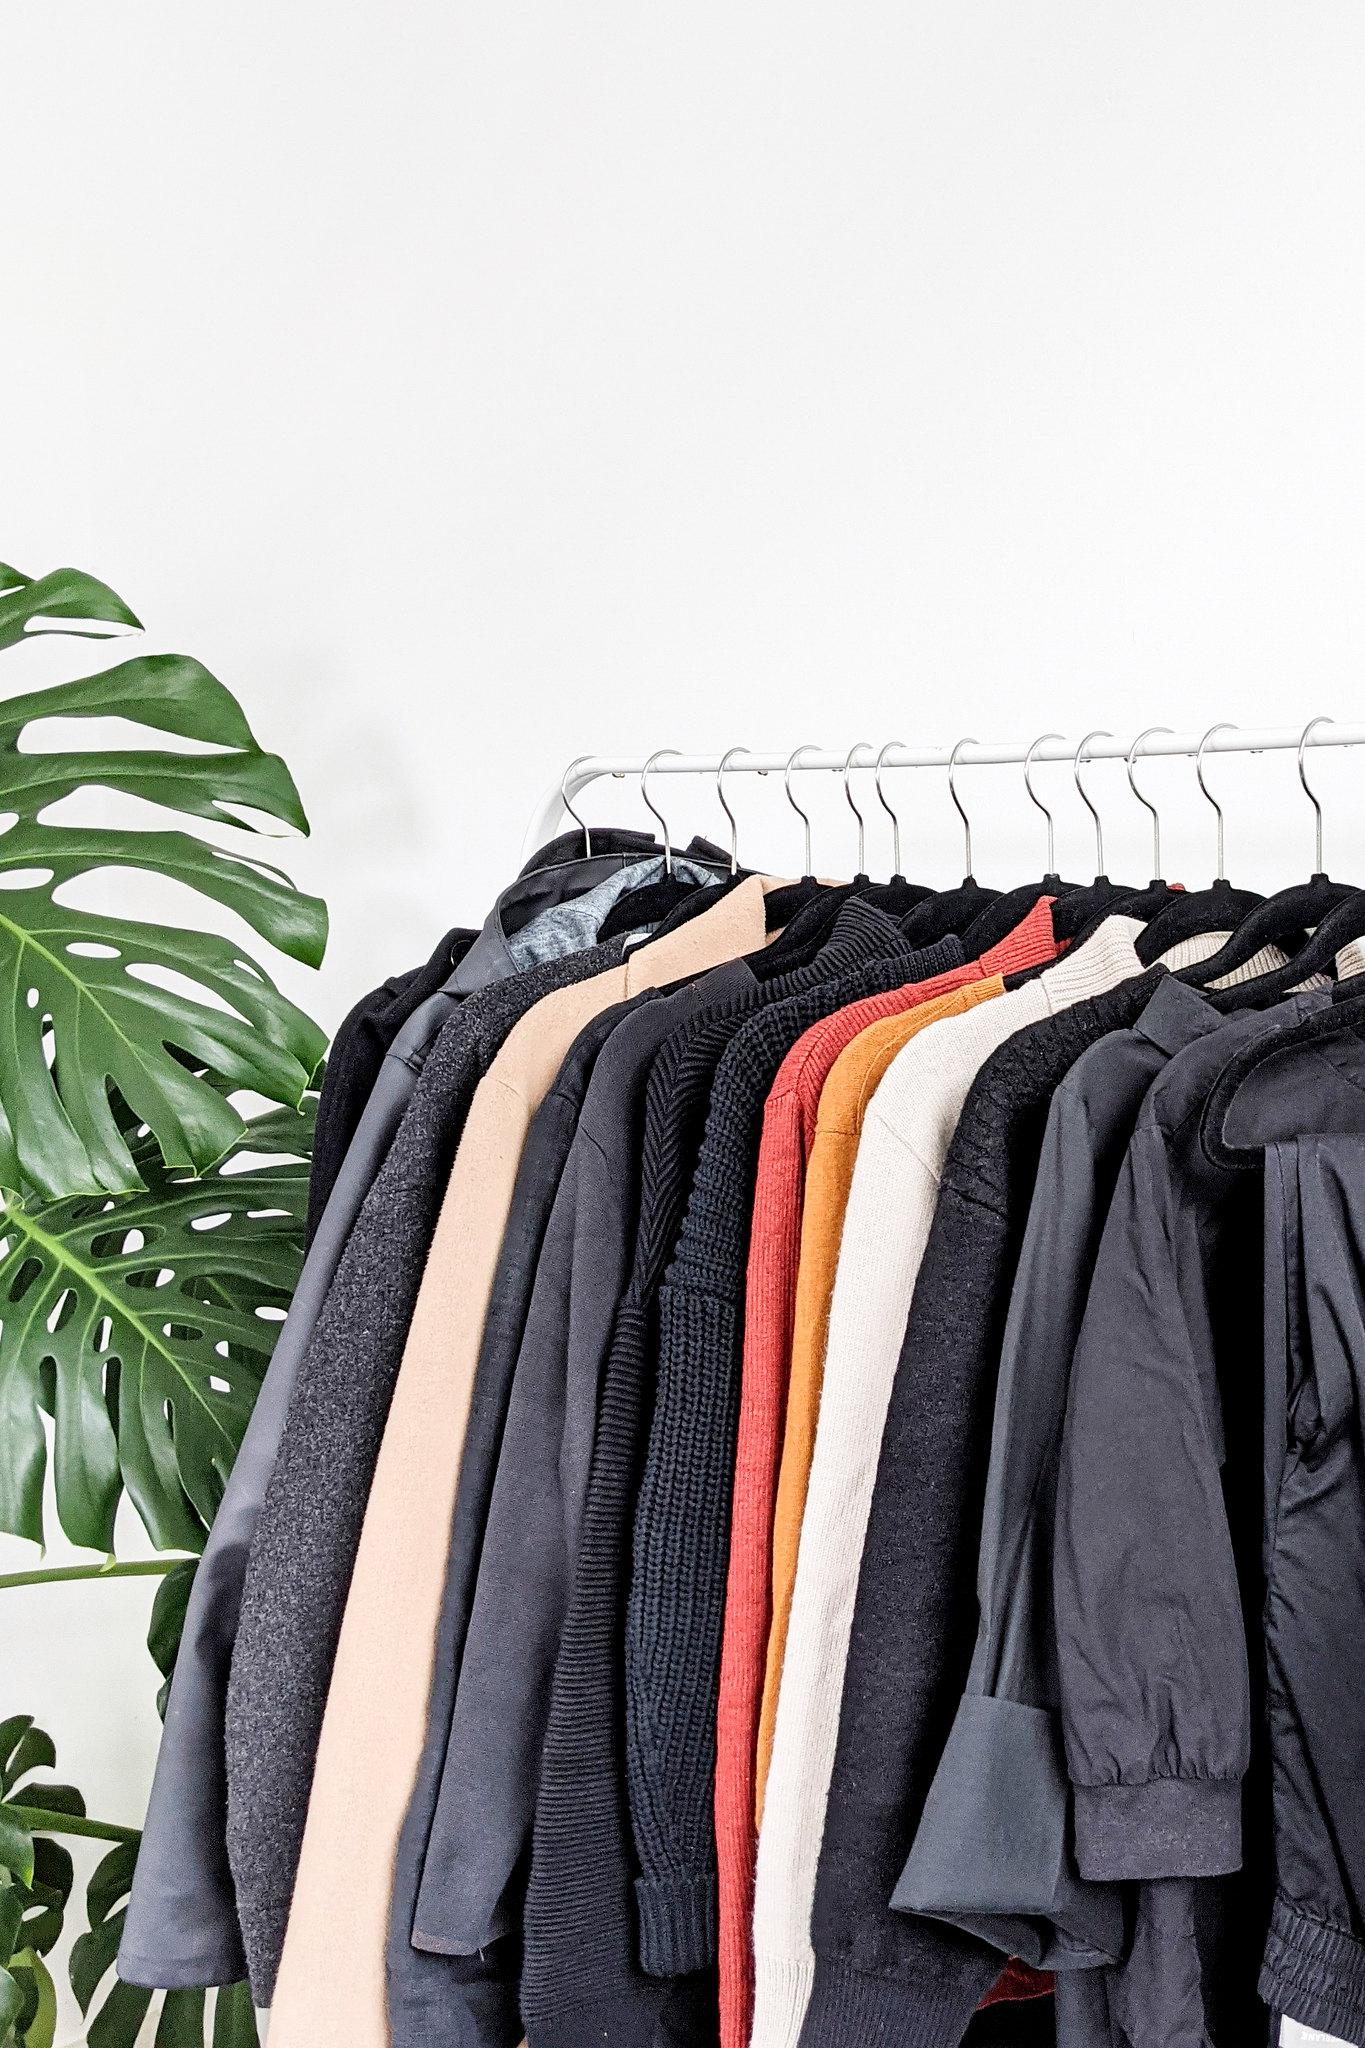 Wardrobe Tracking